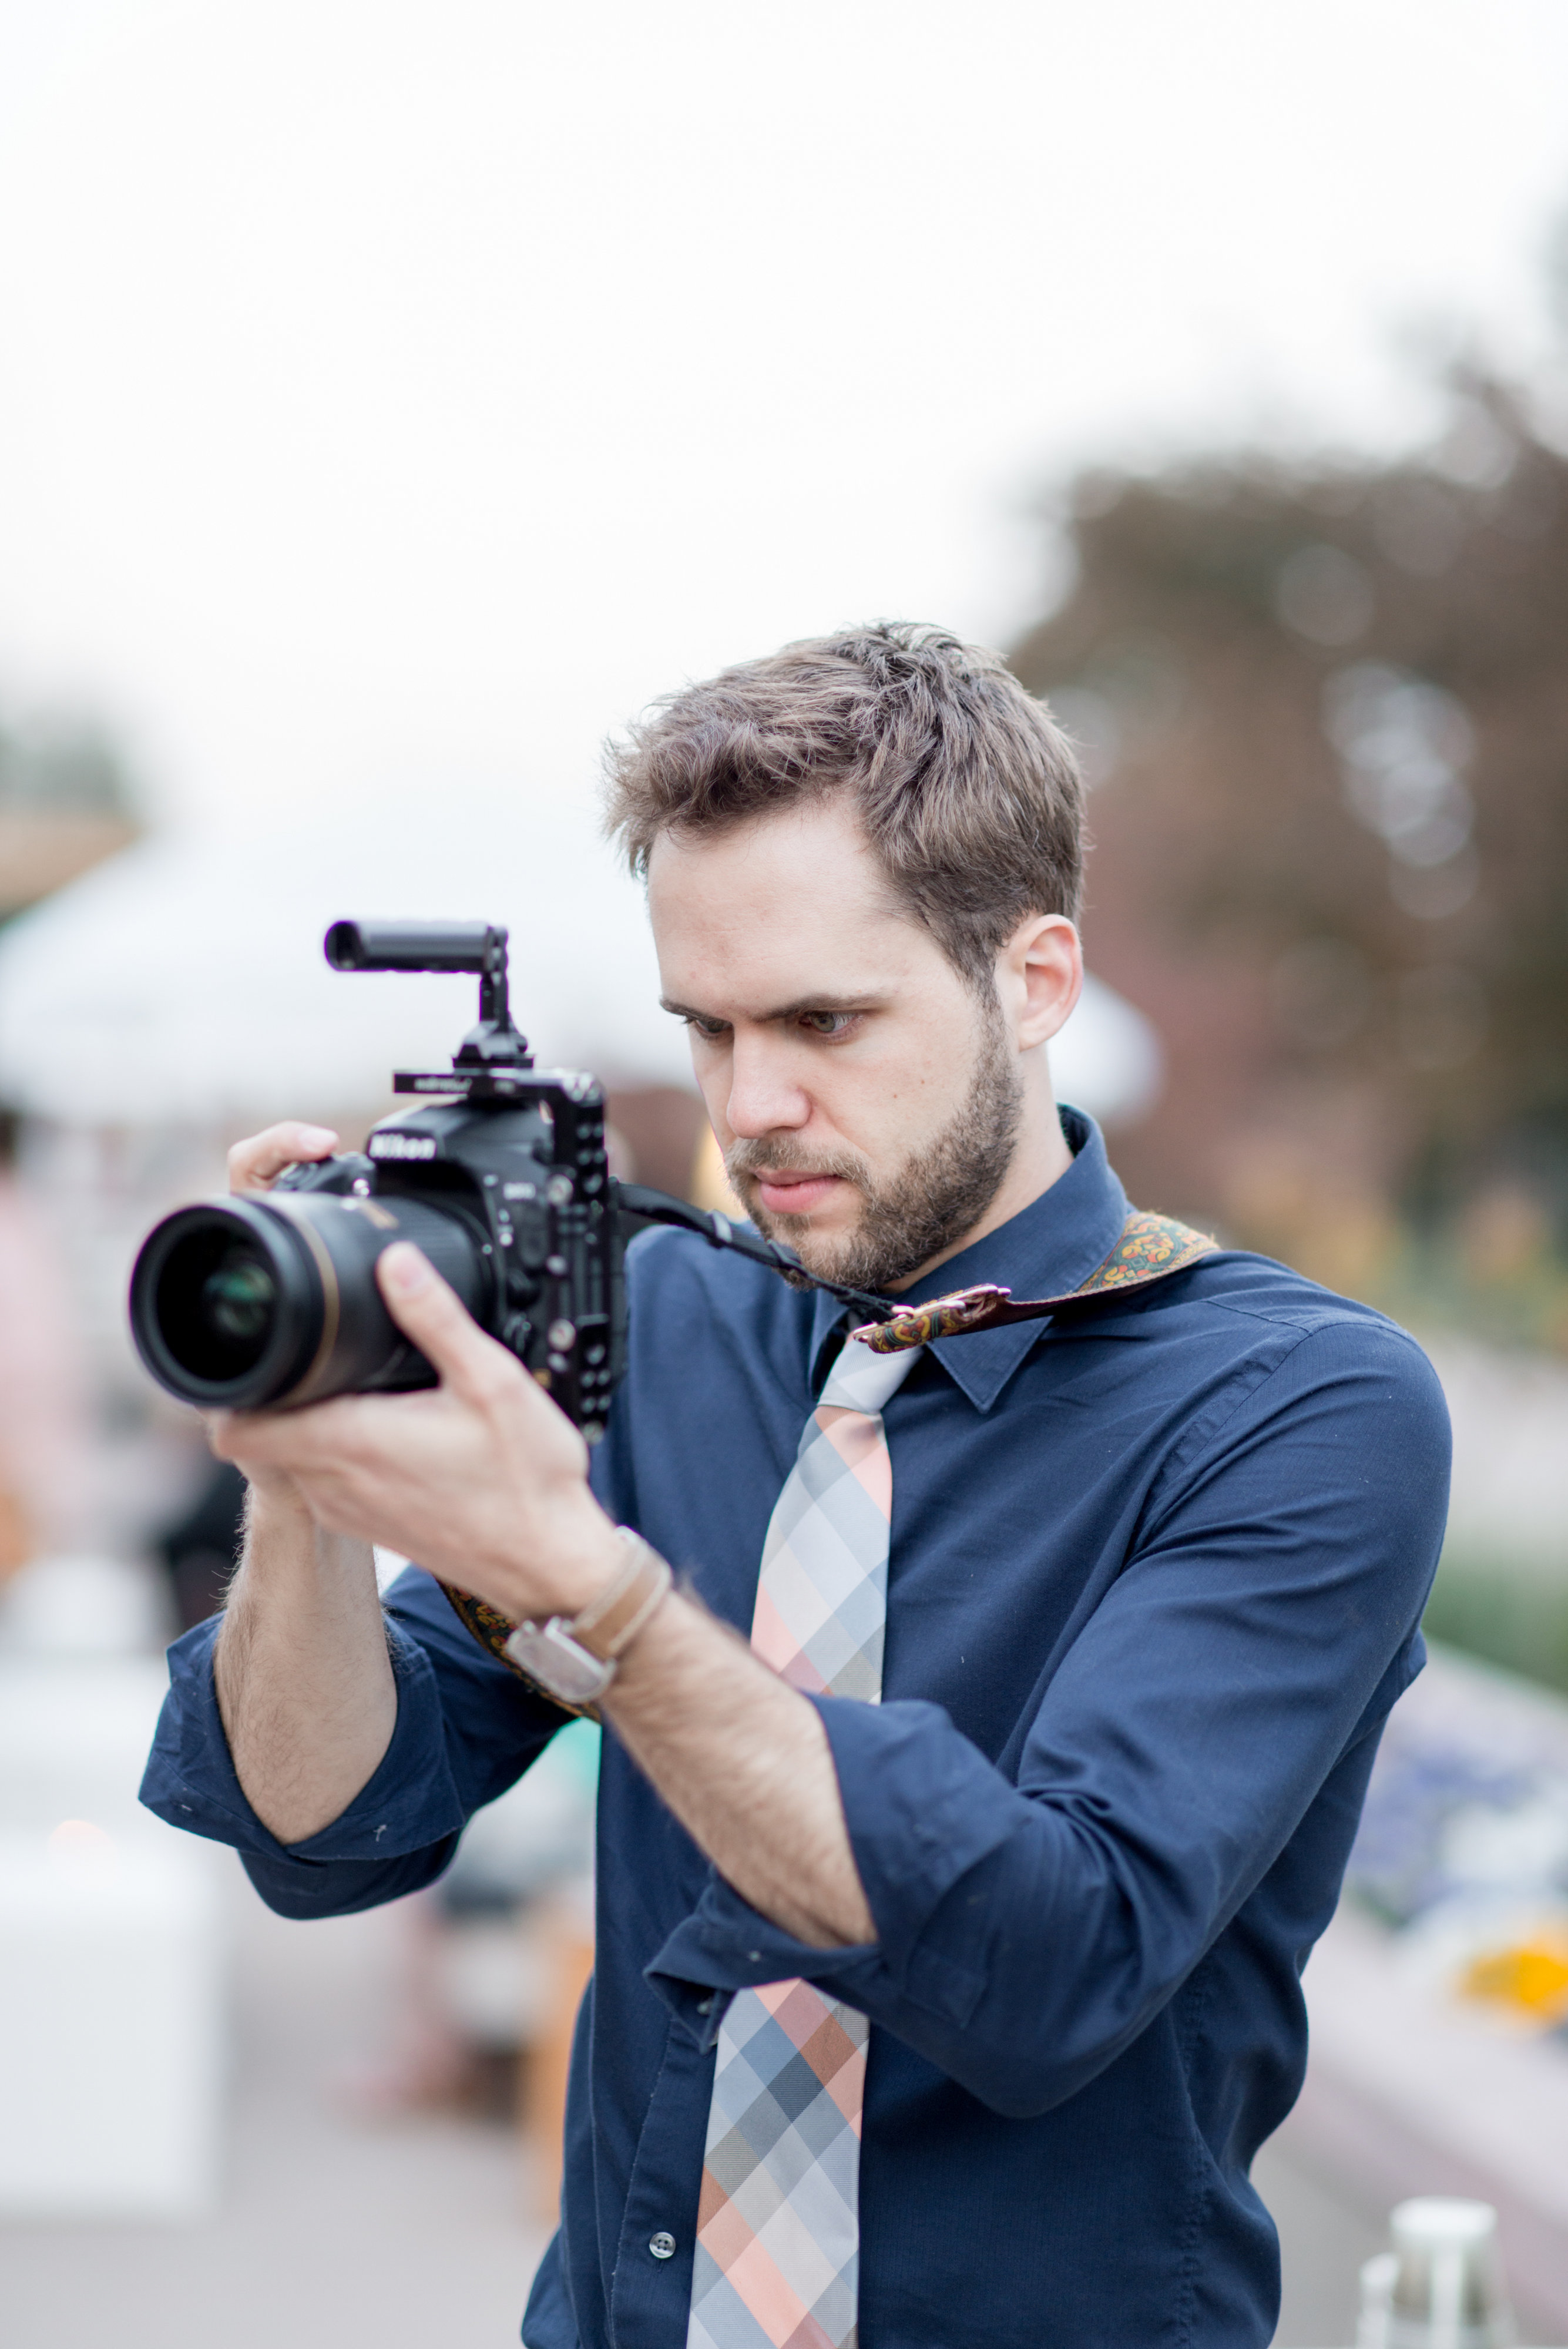 bella-design-planning-videographer-musts-1016.jpg (skyword:350139)